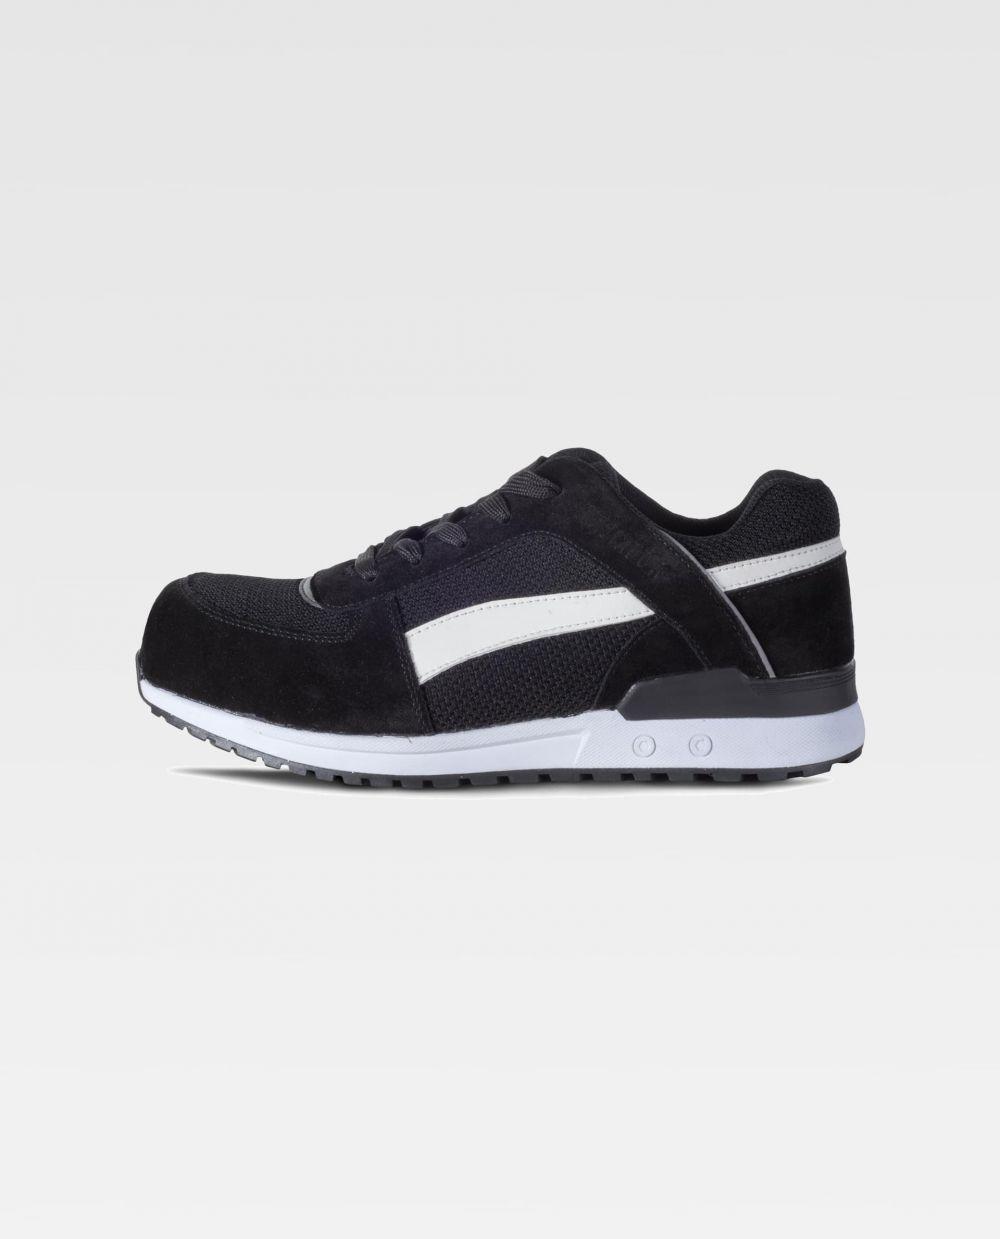 Zapatos de trabajo workteam zapato p3011 de poliéster con impresión vista 1